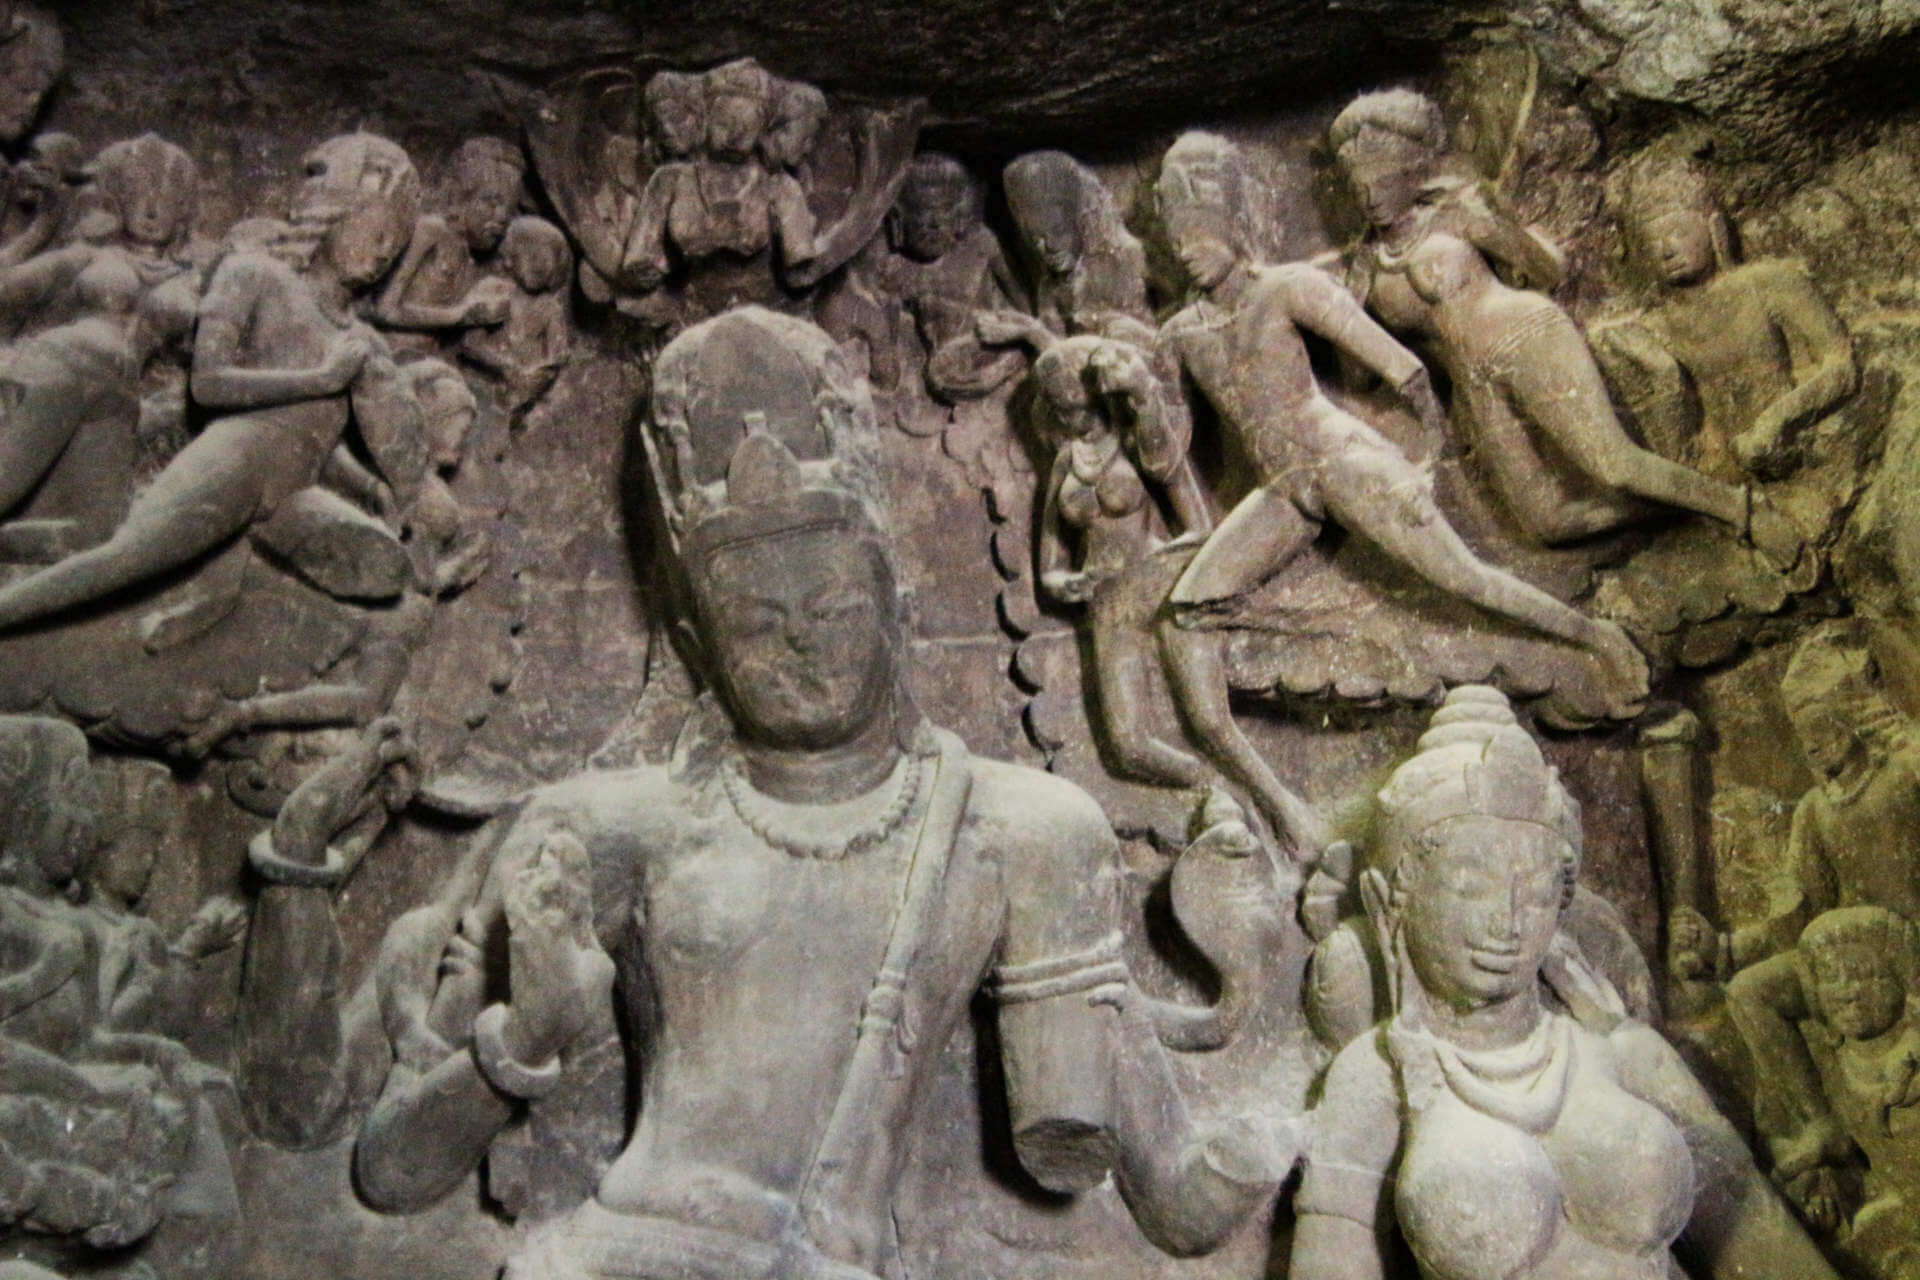 Indien Mumbai Elephanta Island Statue 3